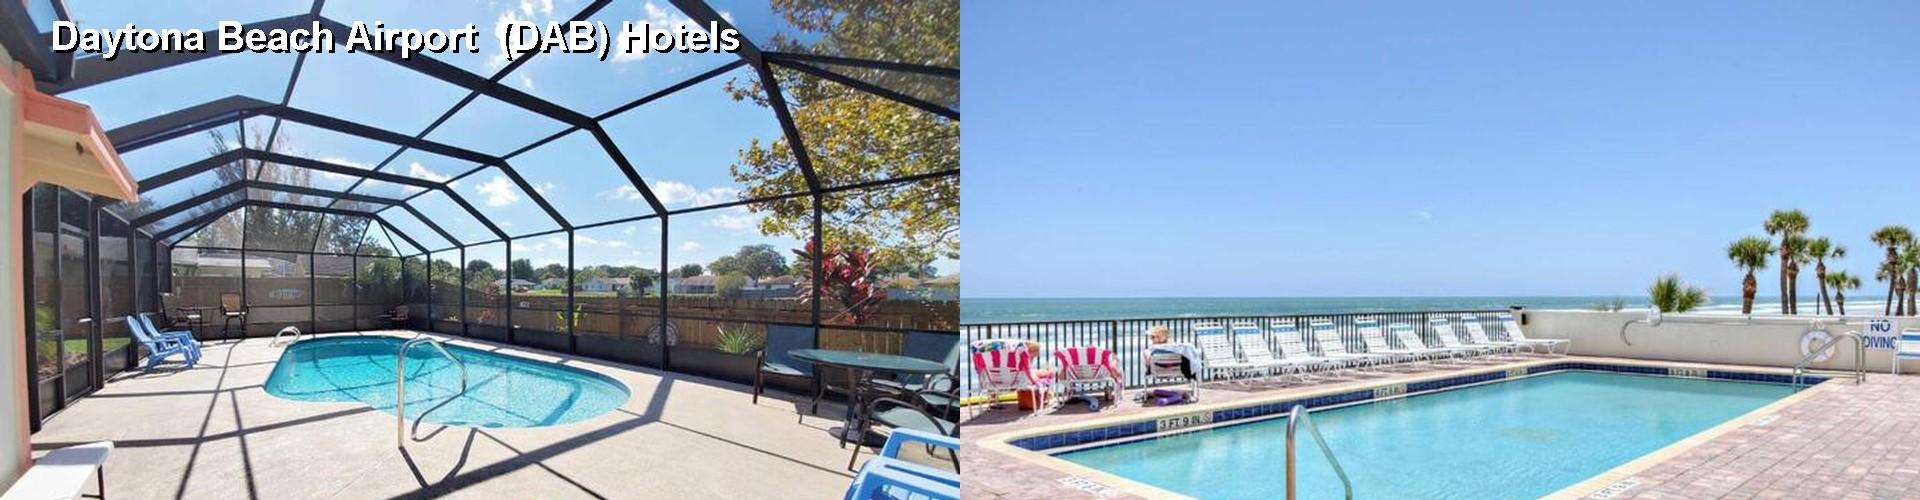 5 Best Hotels Near Daytona Beach Airport Dab